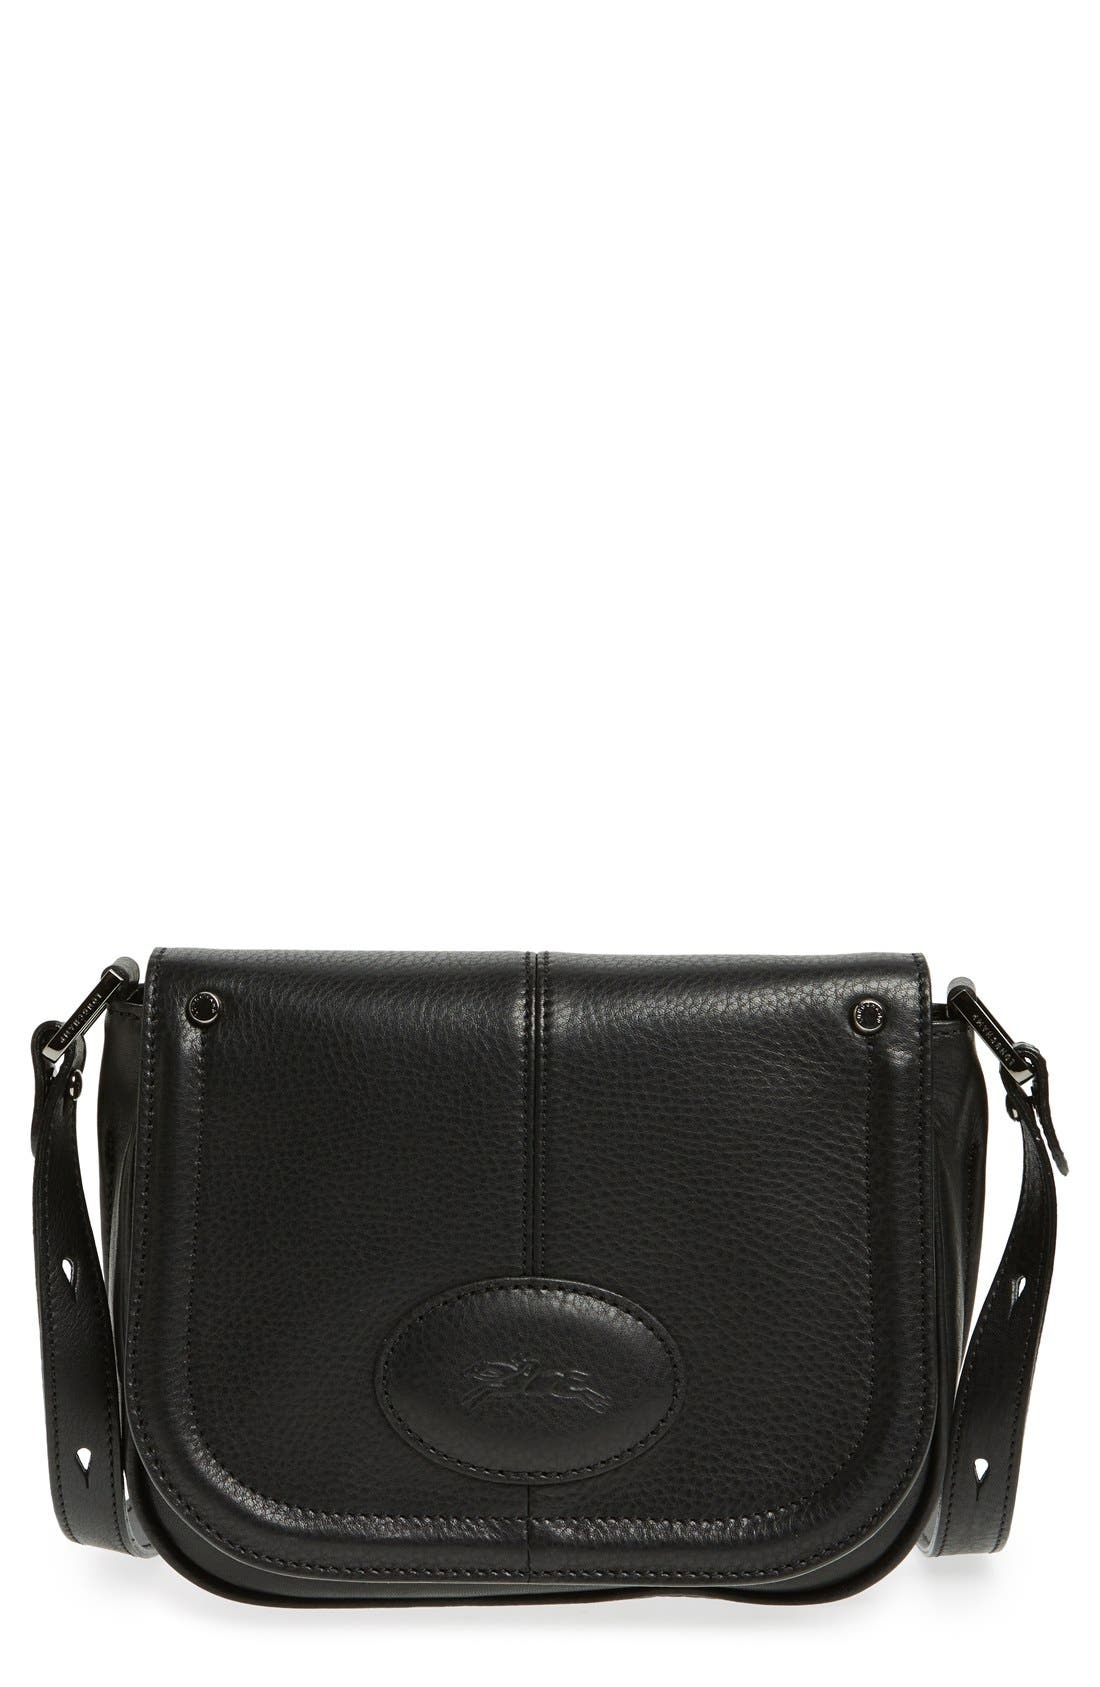 'Small Mystery' Leather Crossbody Bag,                             Main thumbnail 1, color,                             001